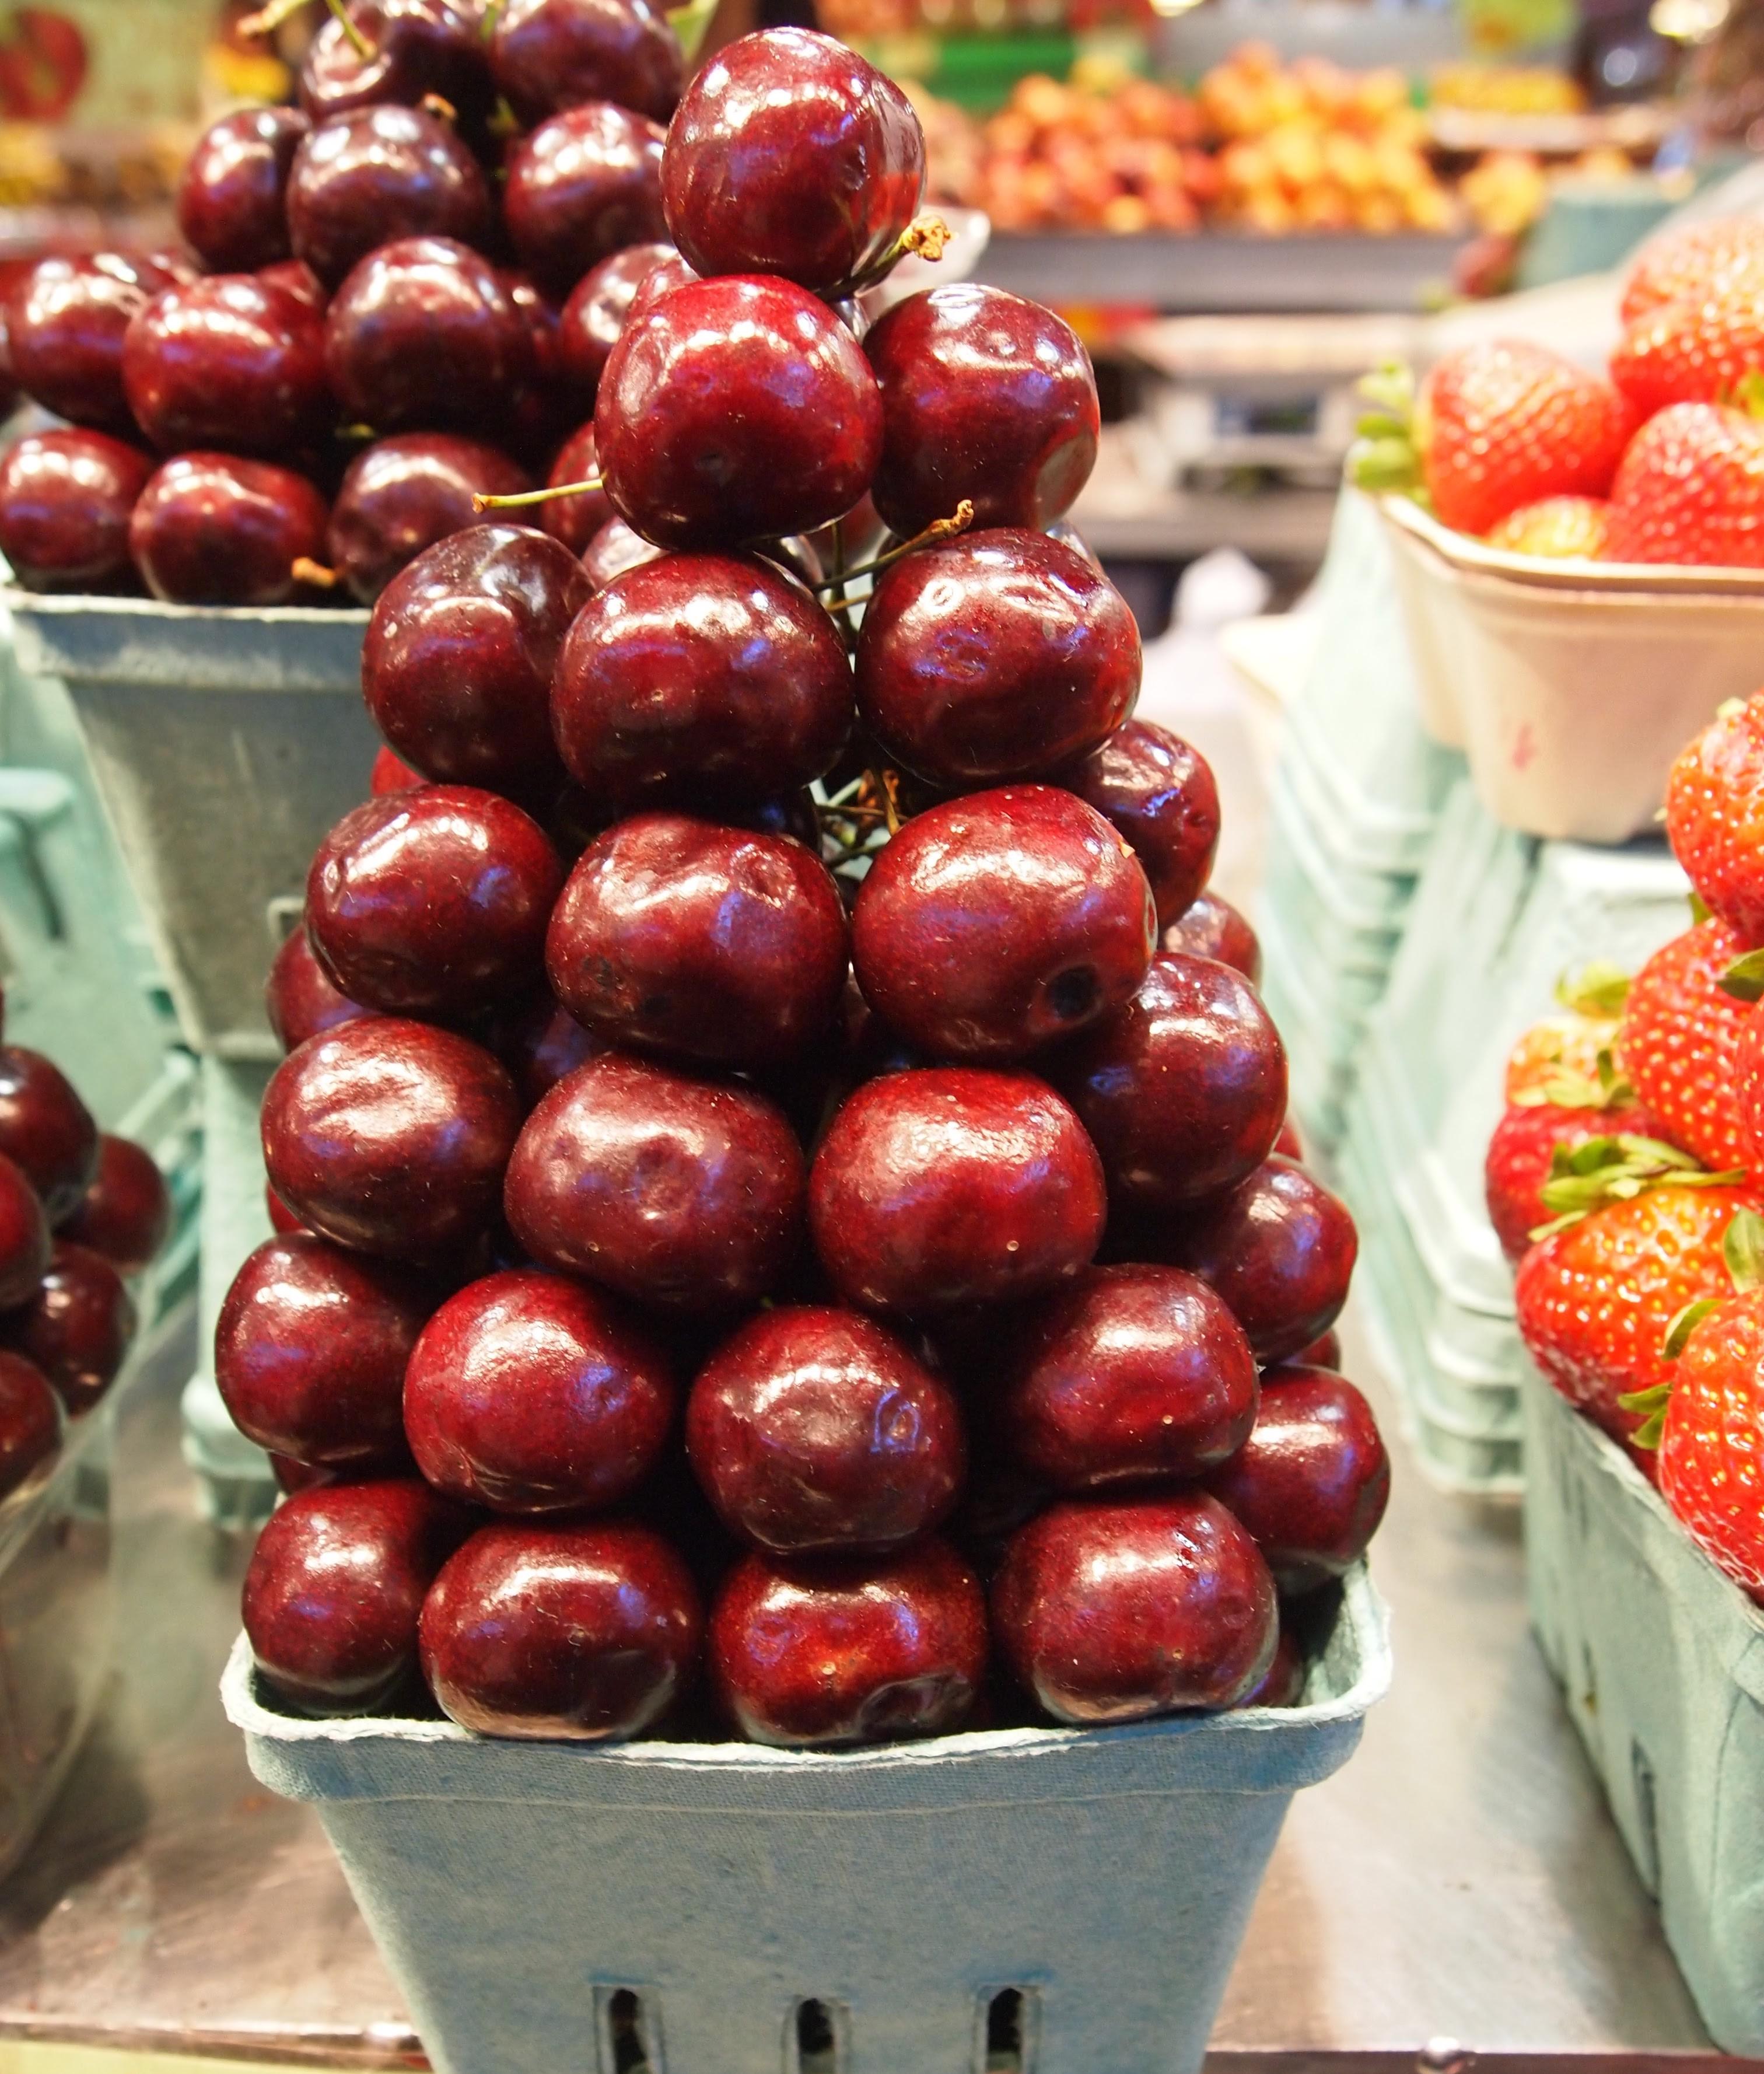 Cherries from Granville Island Public Market